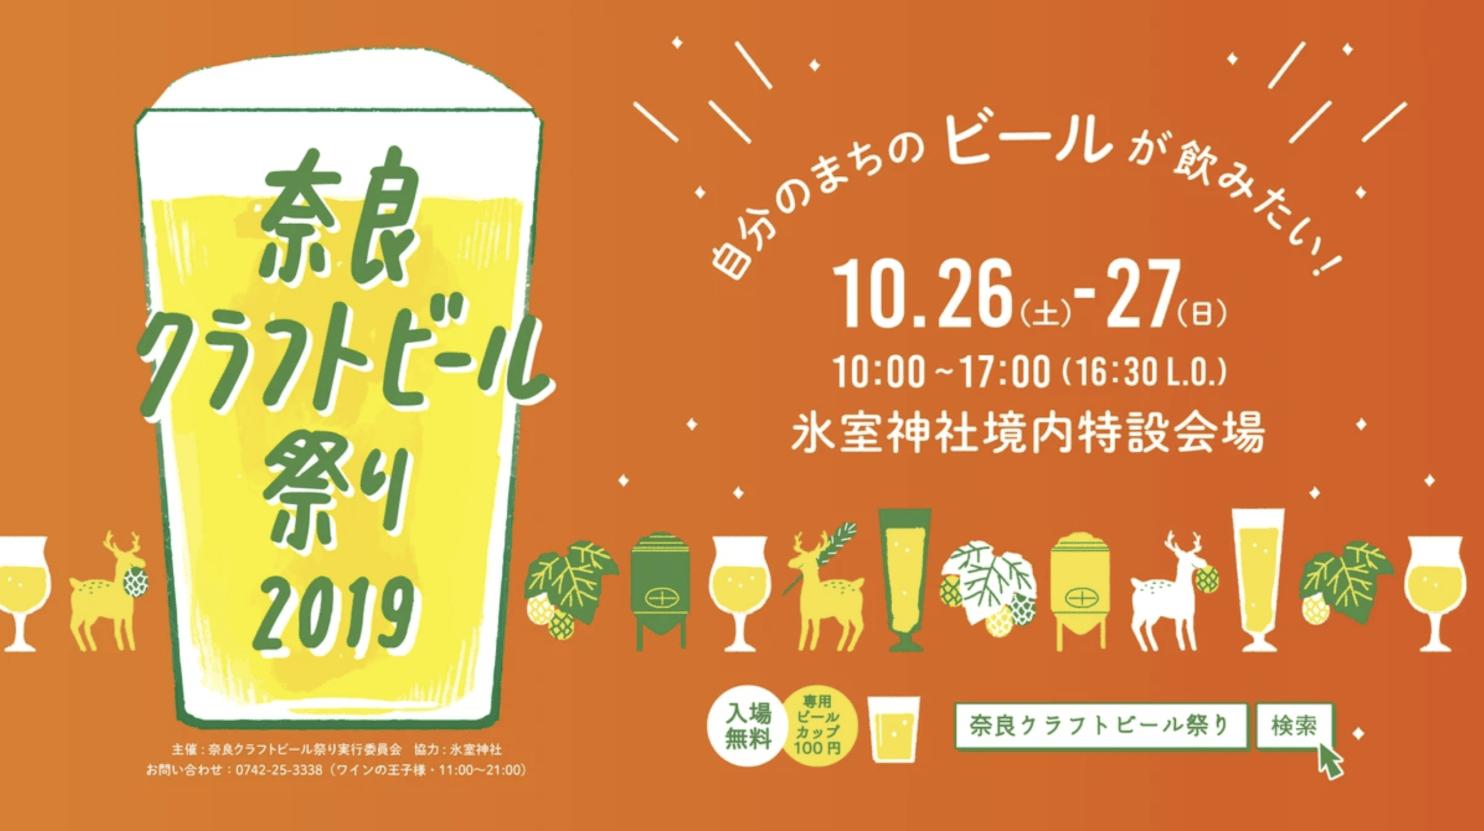 Nara Craft Beer Festival 2019・奈良クラフトビール祭り2019